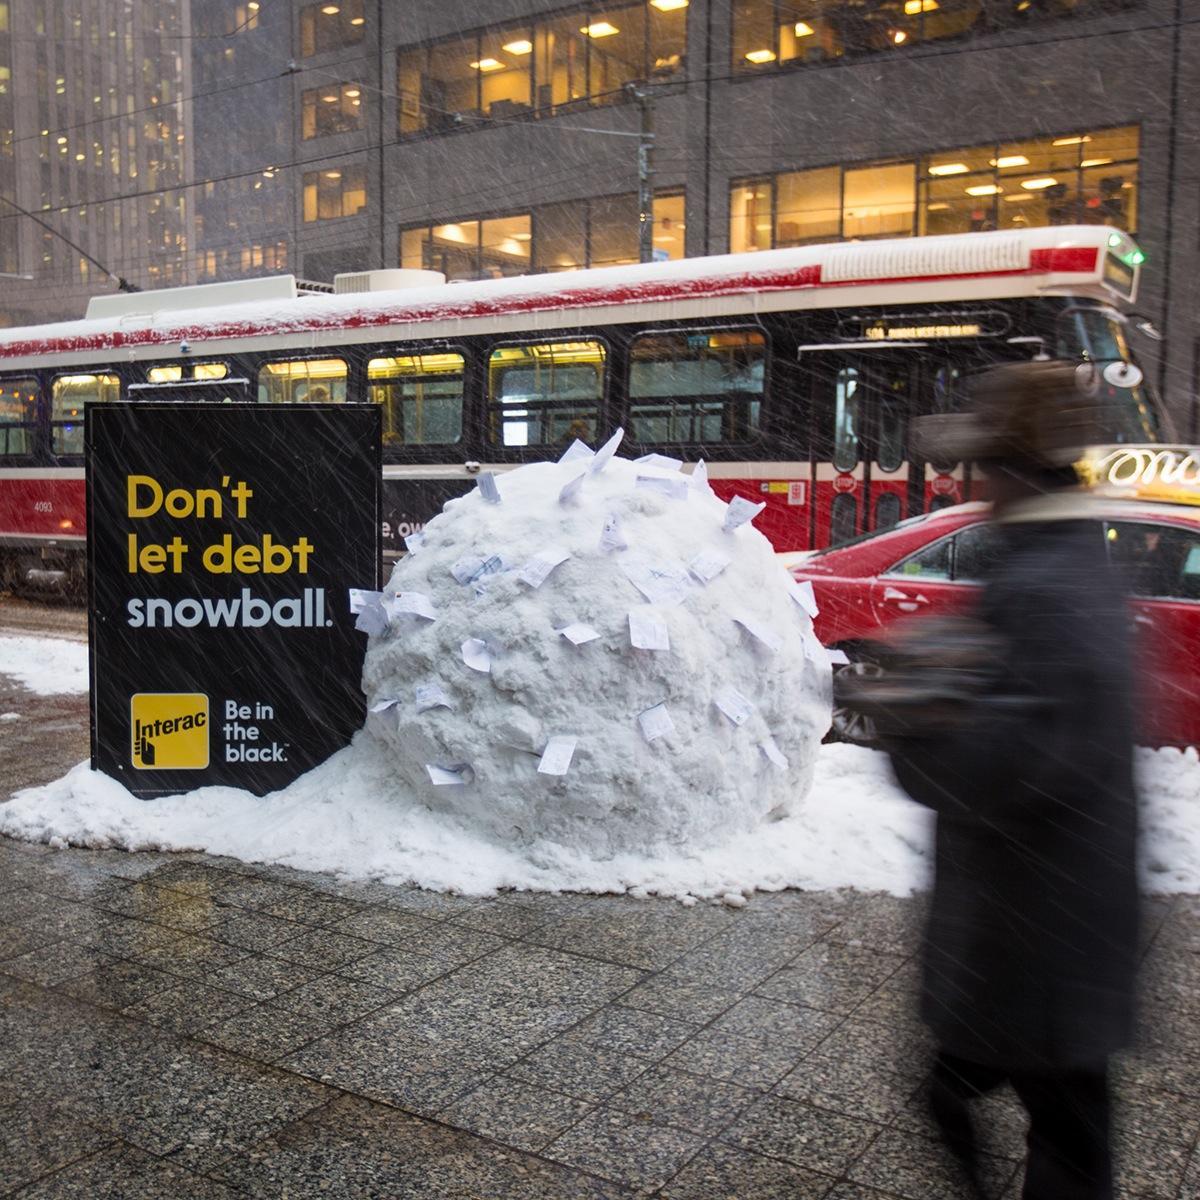 Interac Outdoor Ad -  Snowball